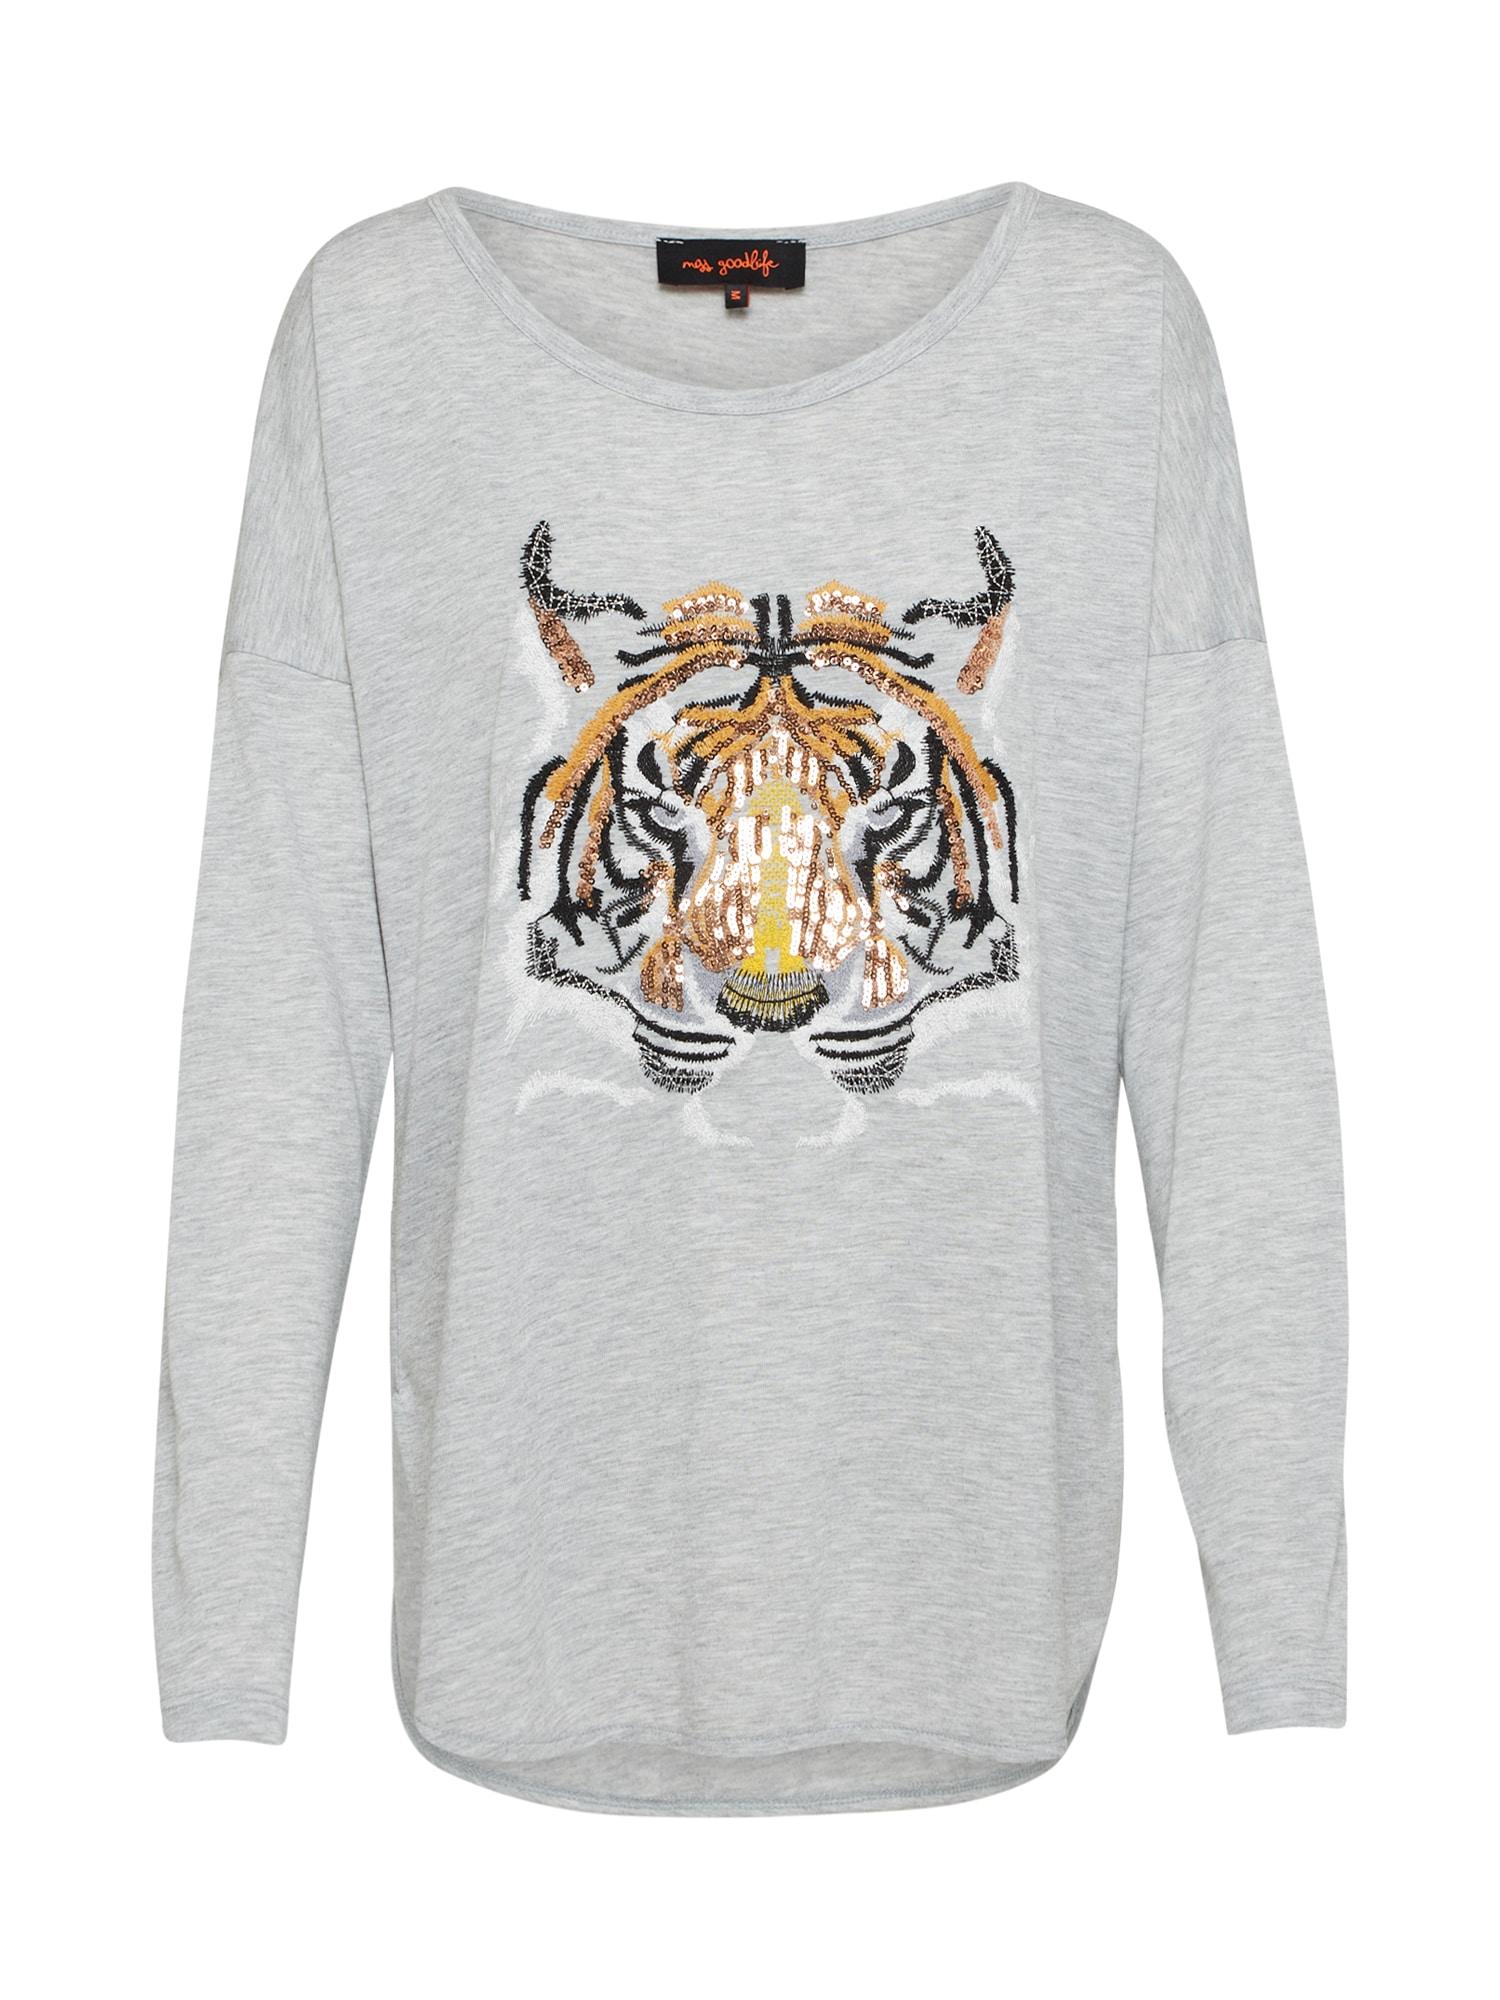 Tričko Tigerhead šedá Miss Goodlife